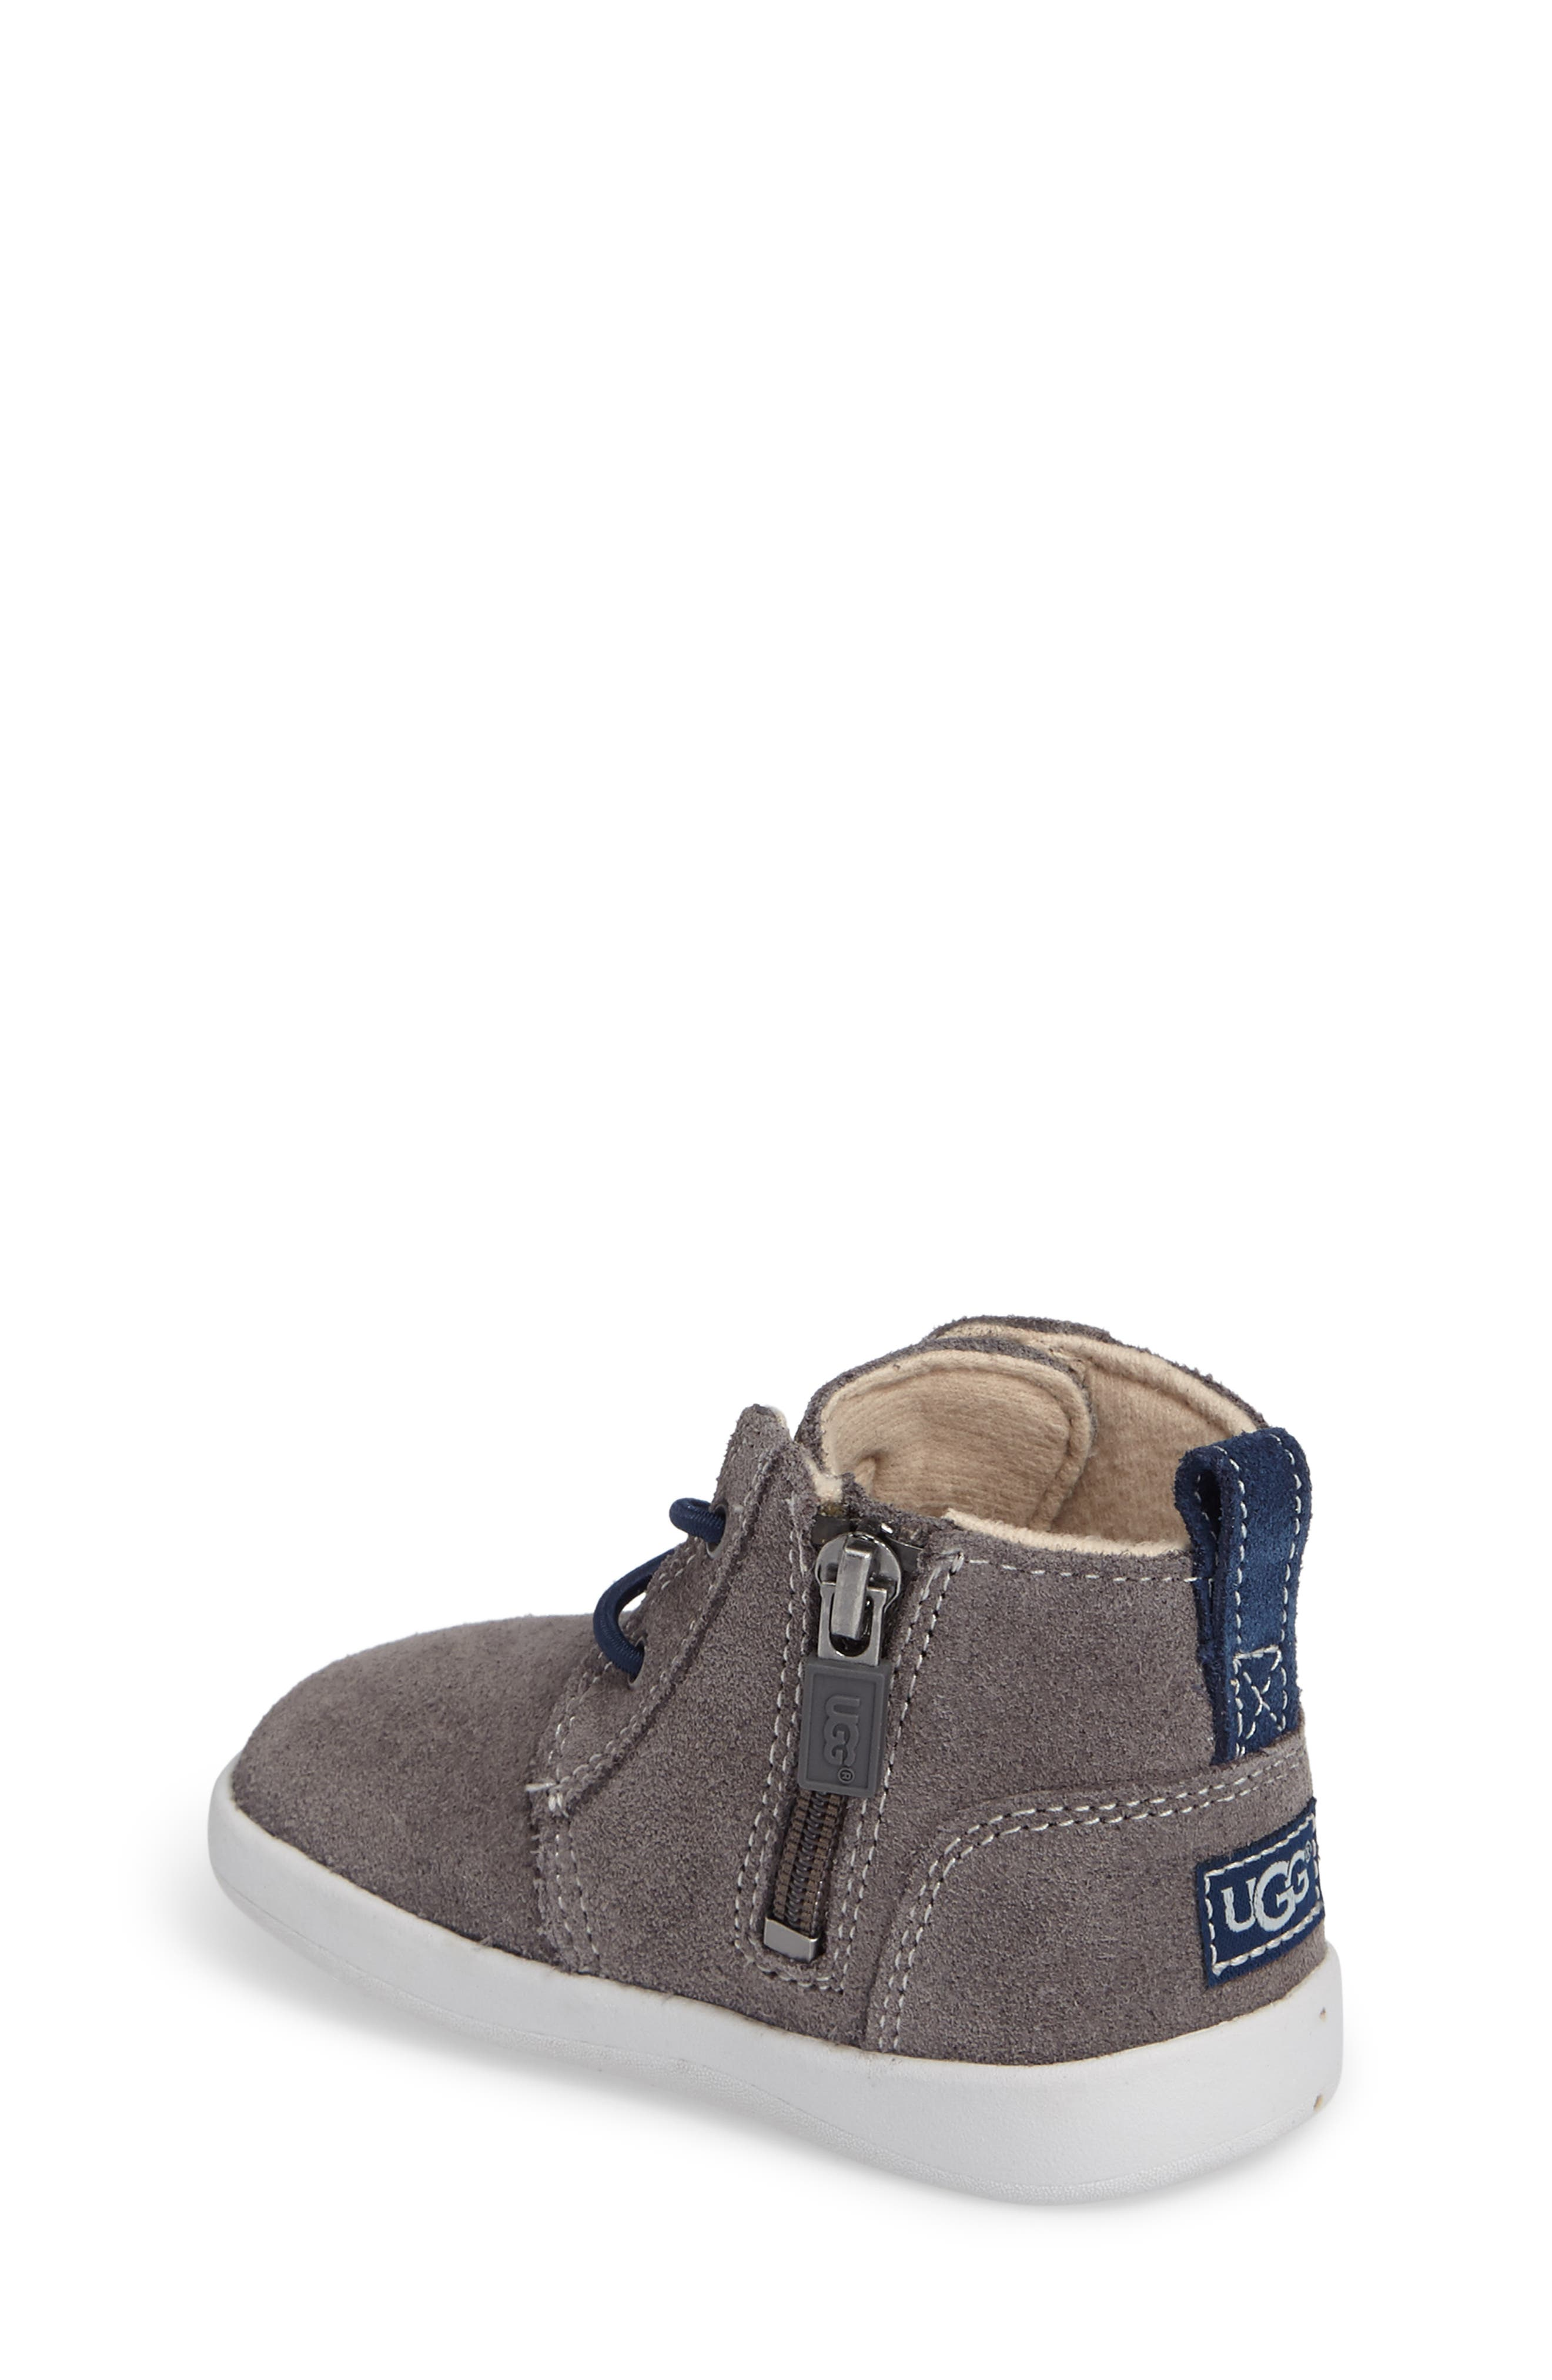 Kristjan Chukka Bootie Sneaker,                             Alternate thumbnail 2, color,                             Charcoal